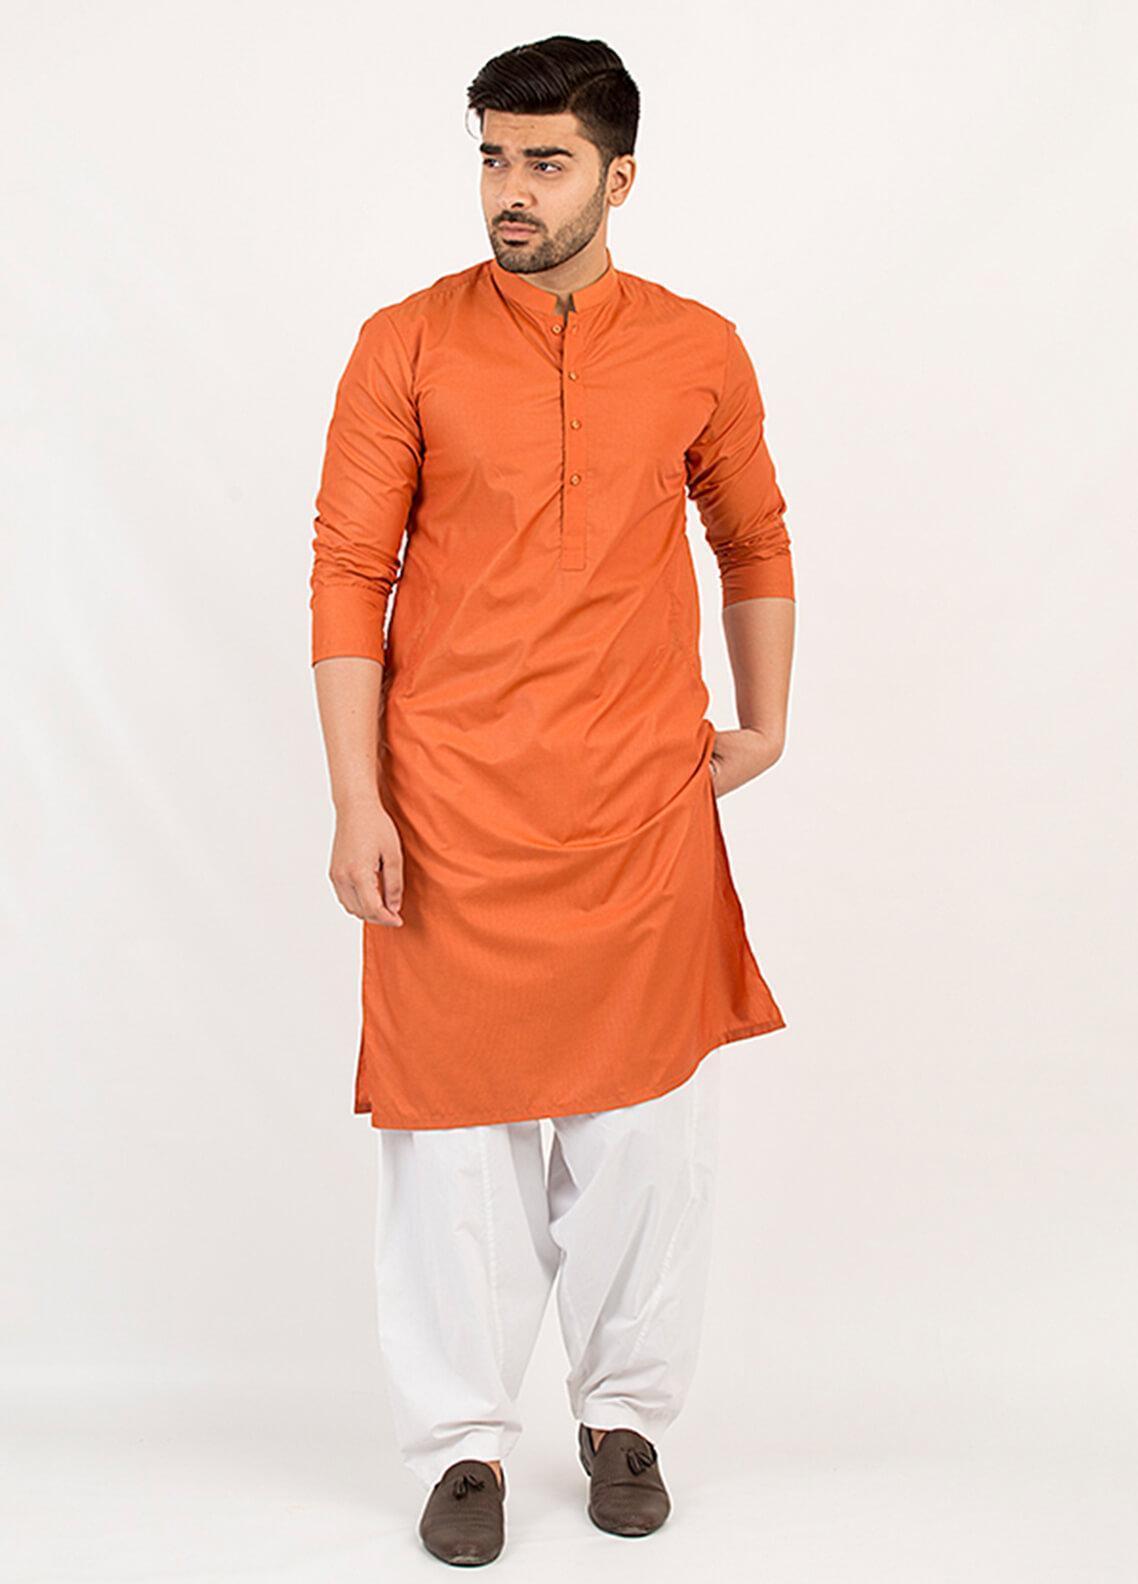 Shahzeb Saeed Wash N Wear Formal Kurta for Men - Rust KURTA-109